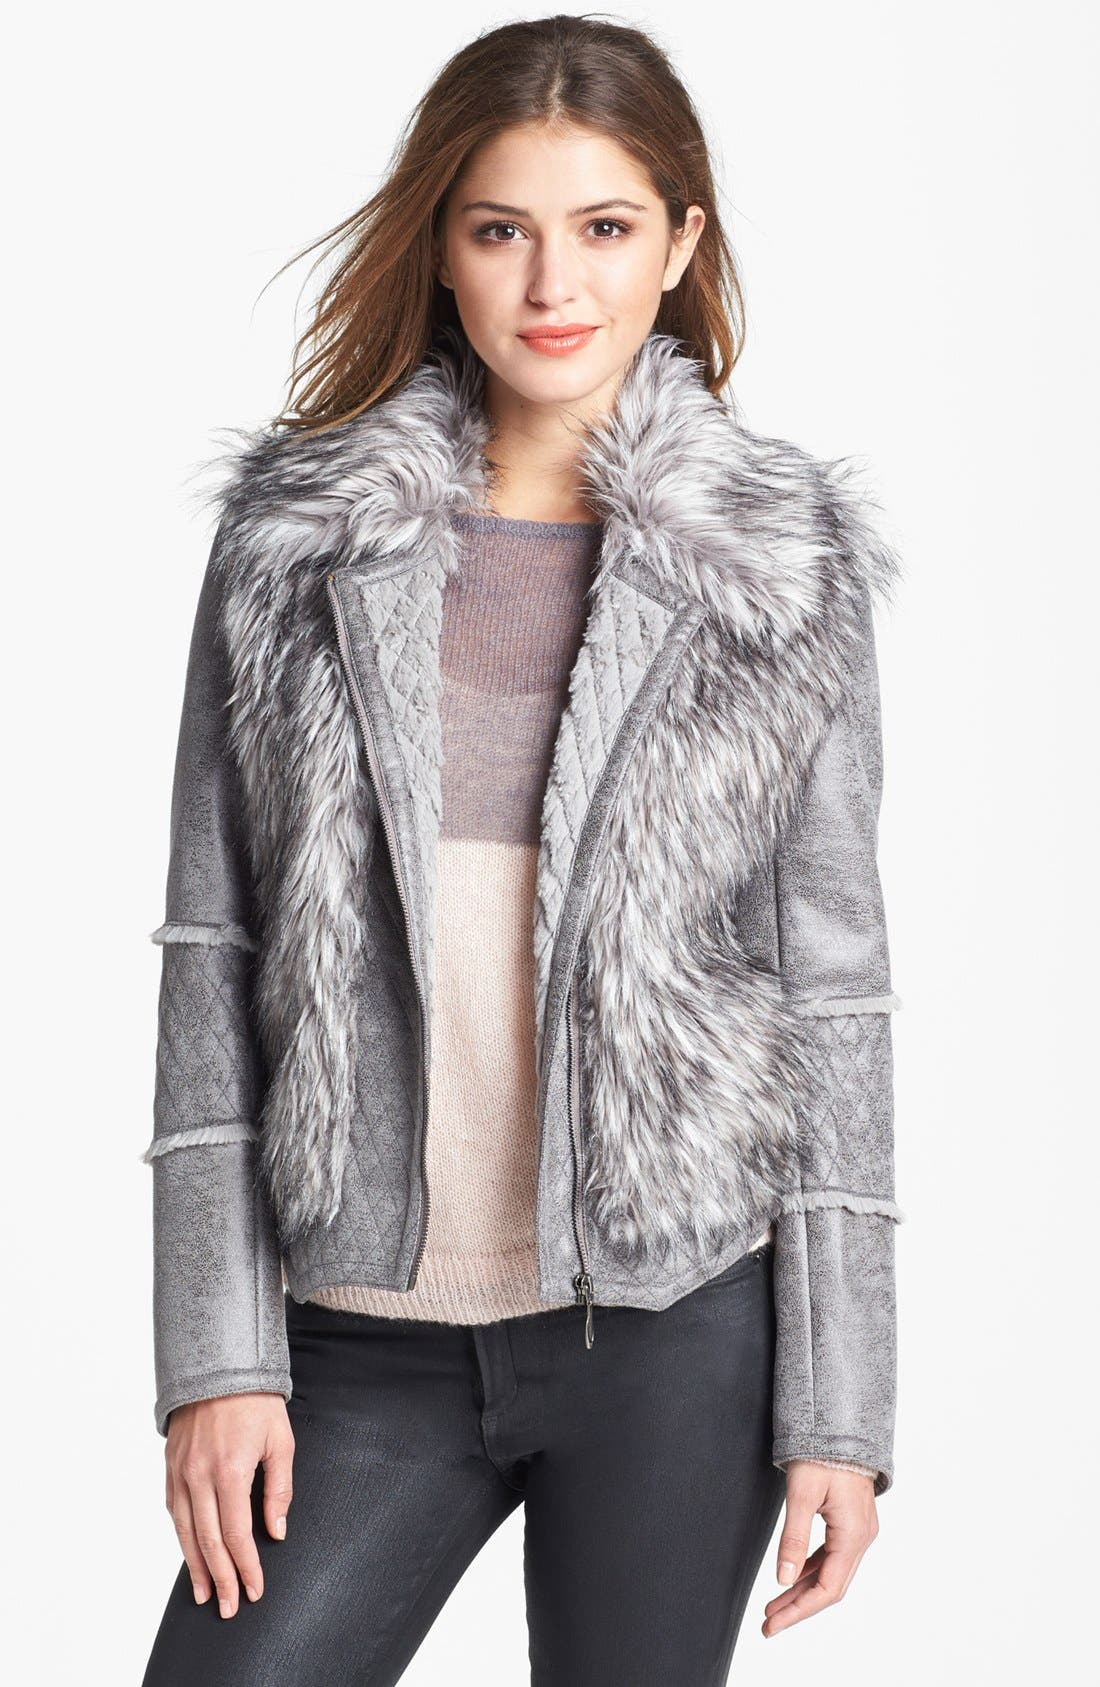 Alternate Image 1 Selected - Kristen Blake Faux Shearling & Faux Fur Moto Jacket (Nordstrom Exclusive)